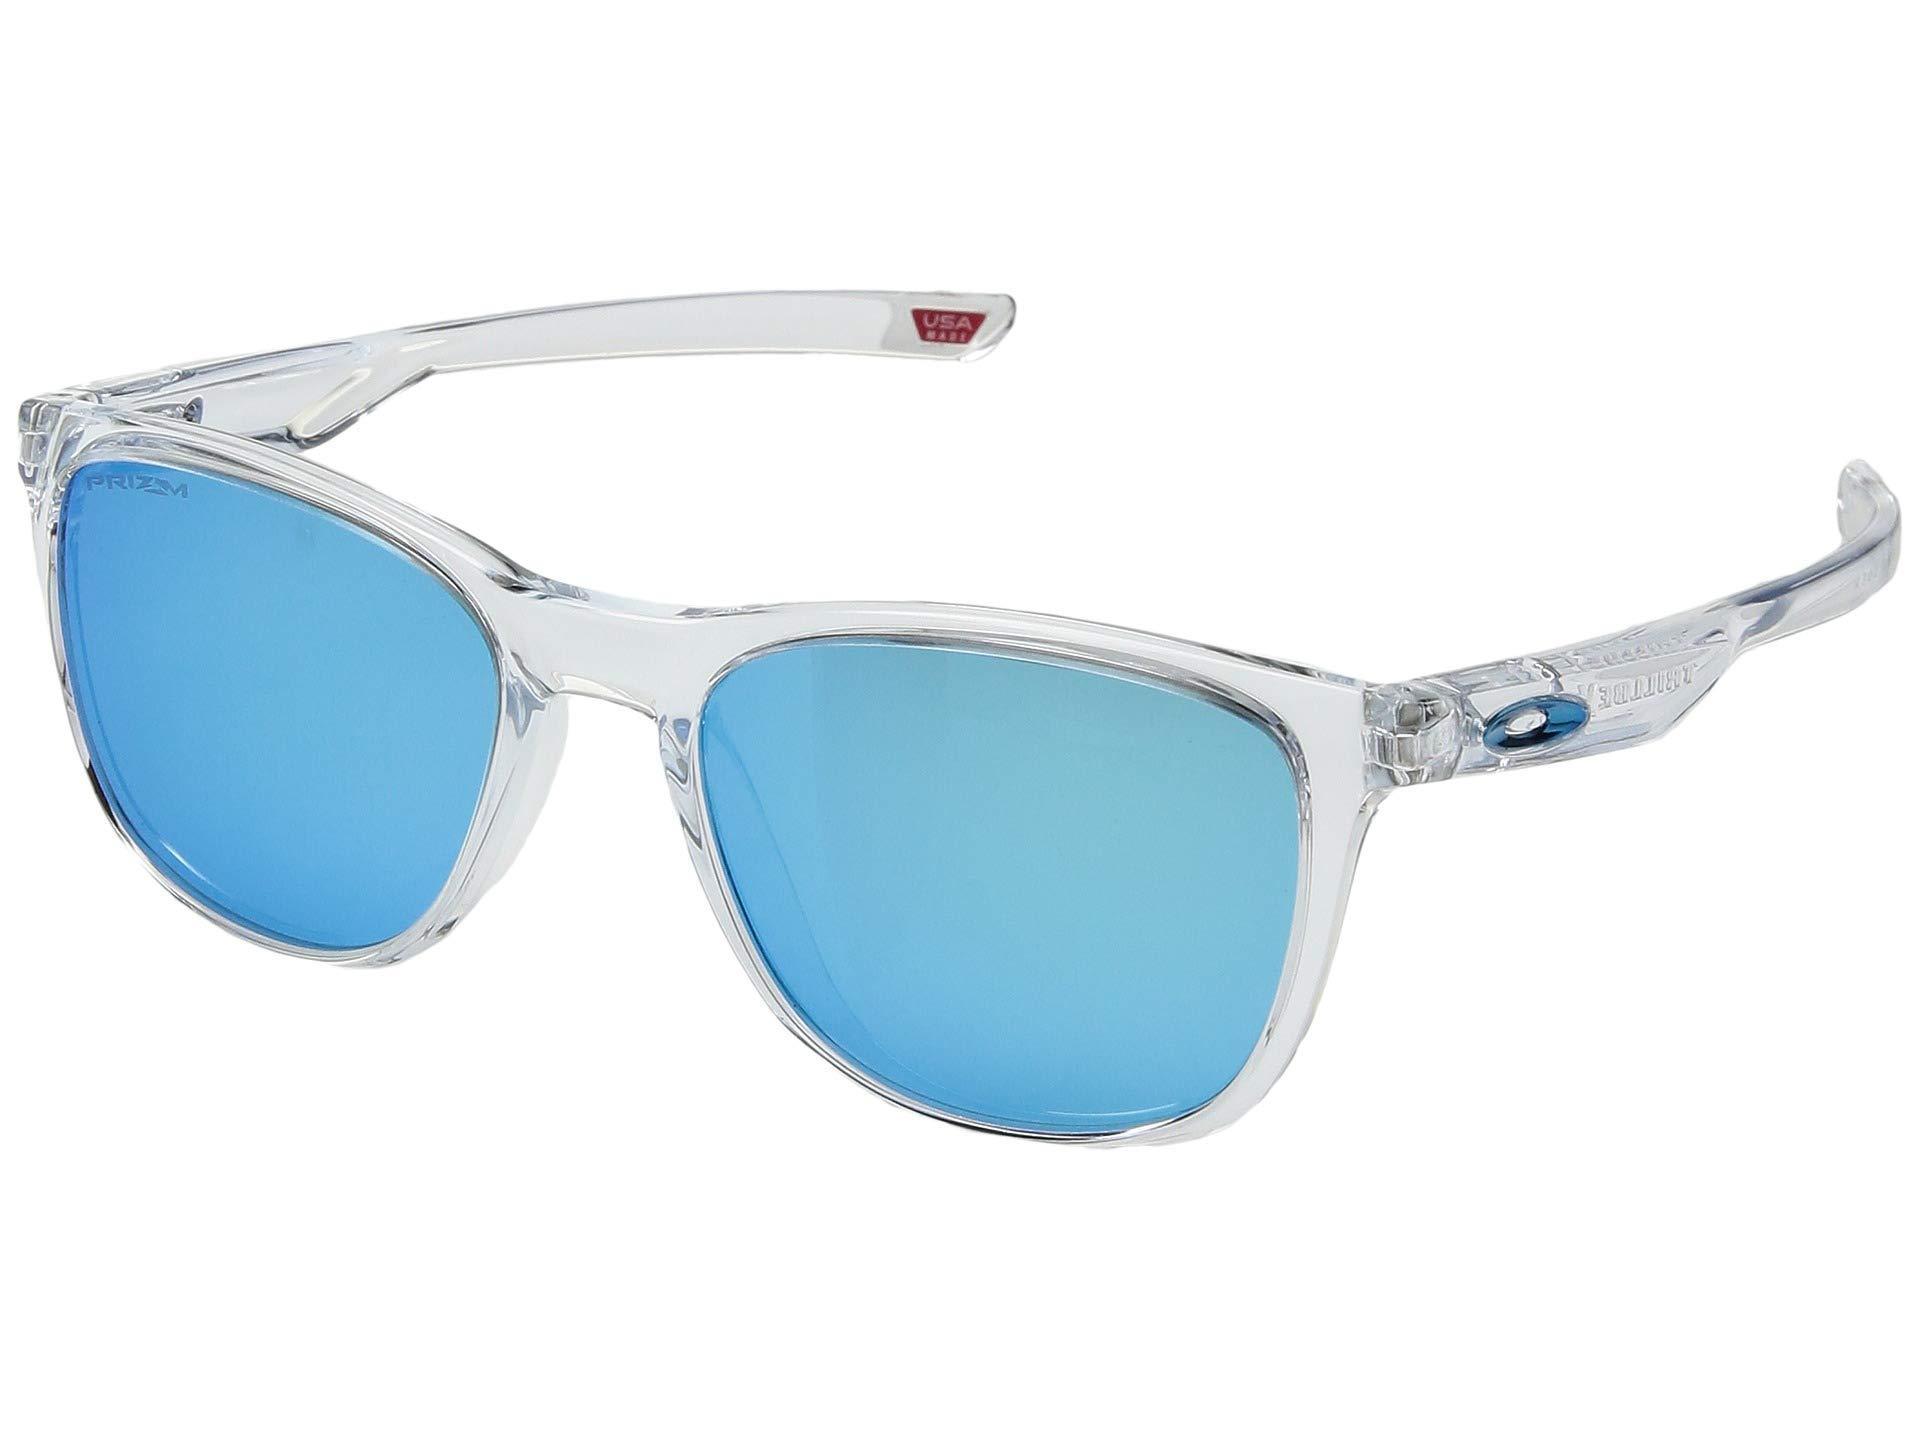 5163e59df867 Lyst - Oakley Trillbe X (polished Clear prizm Sapphire) Sport ...